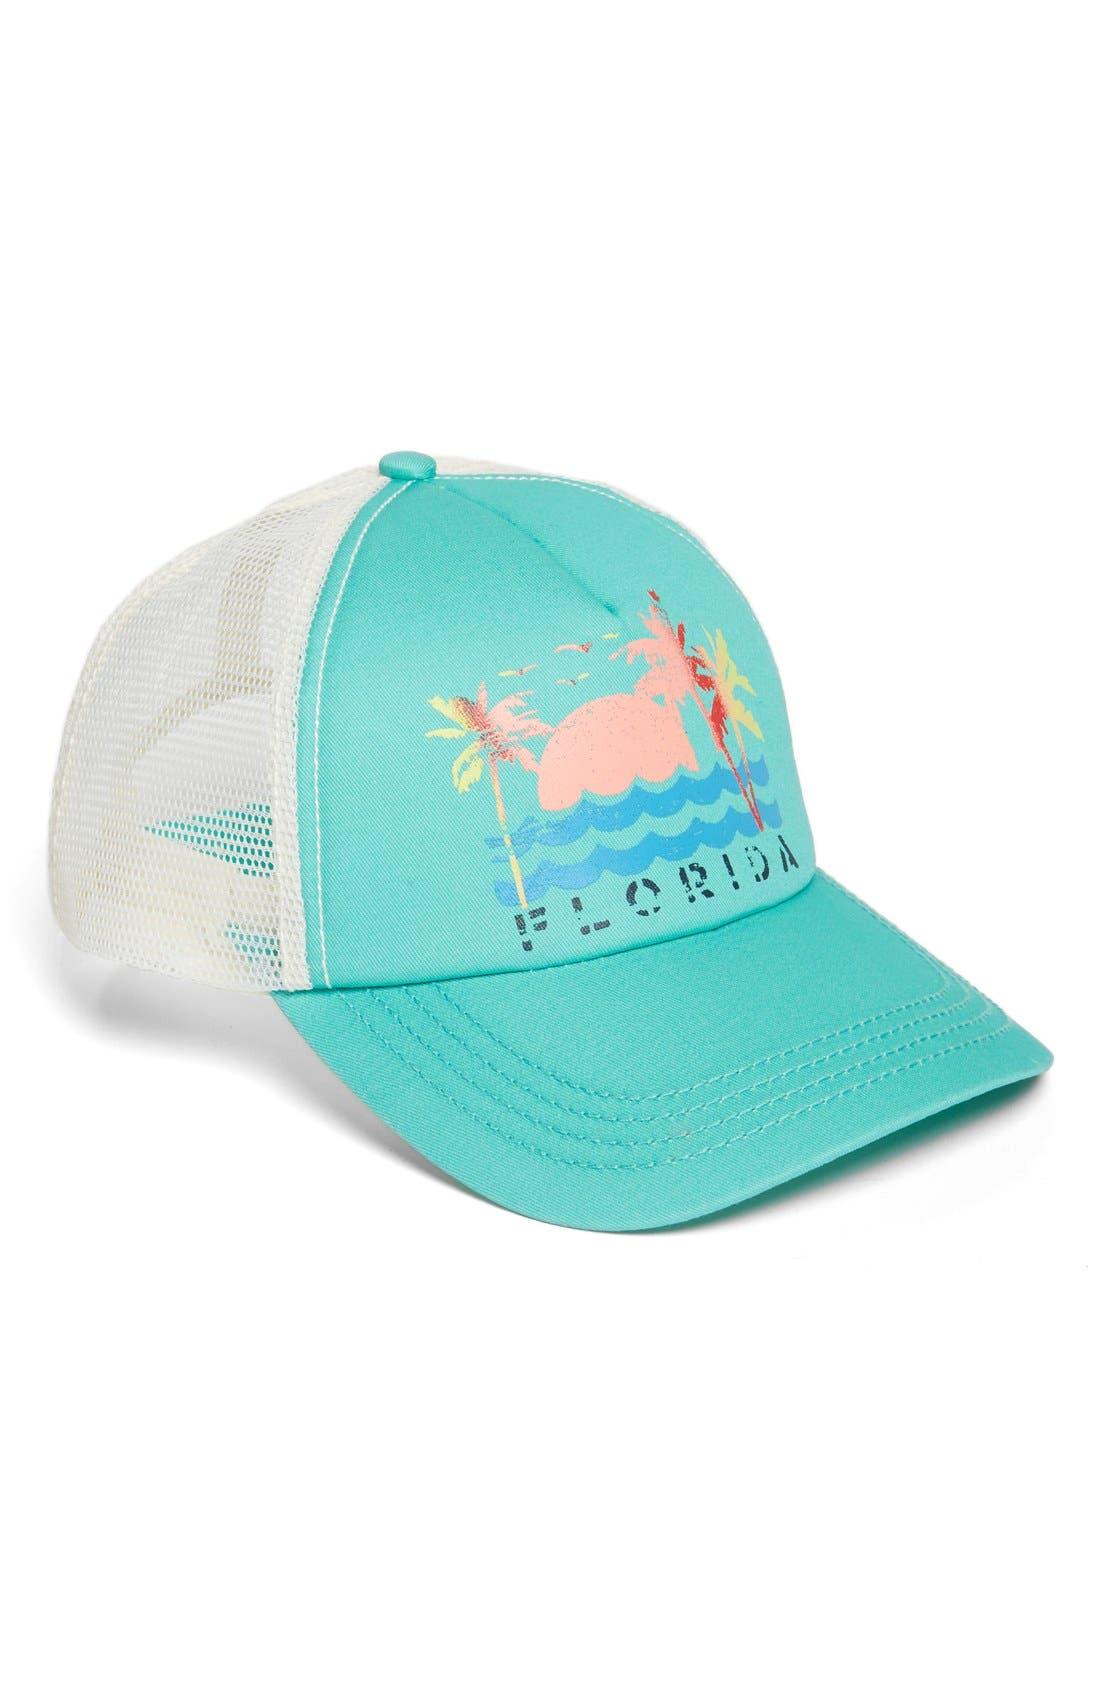 Main Image - Billabong 'Destination Vacay' Graphic Trucker Hat